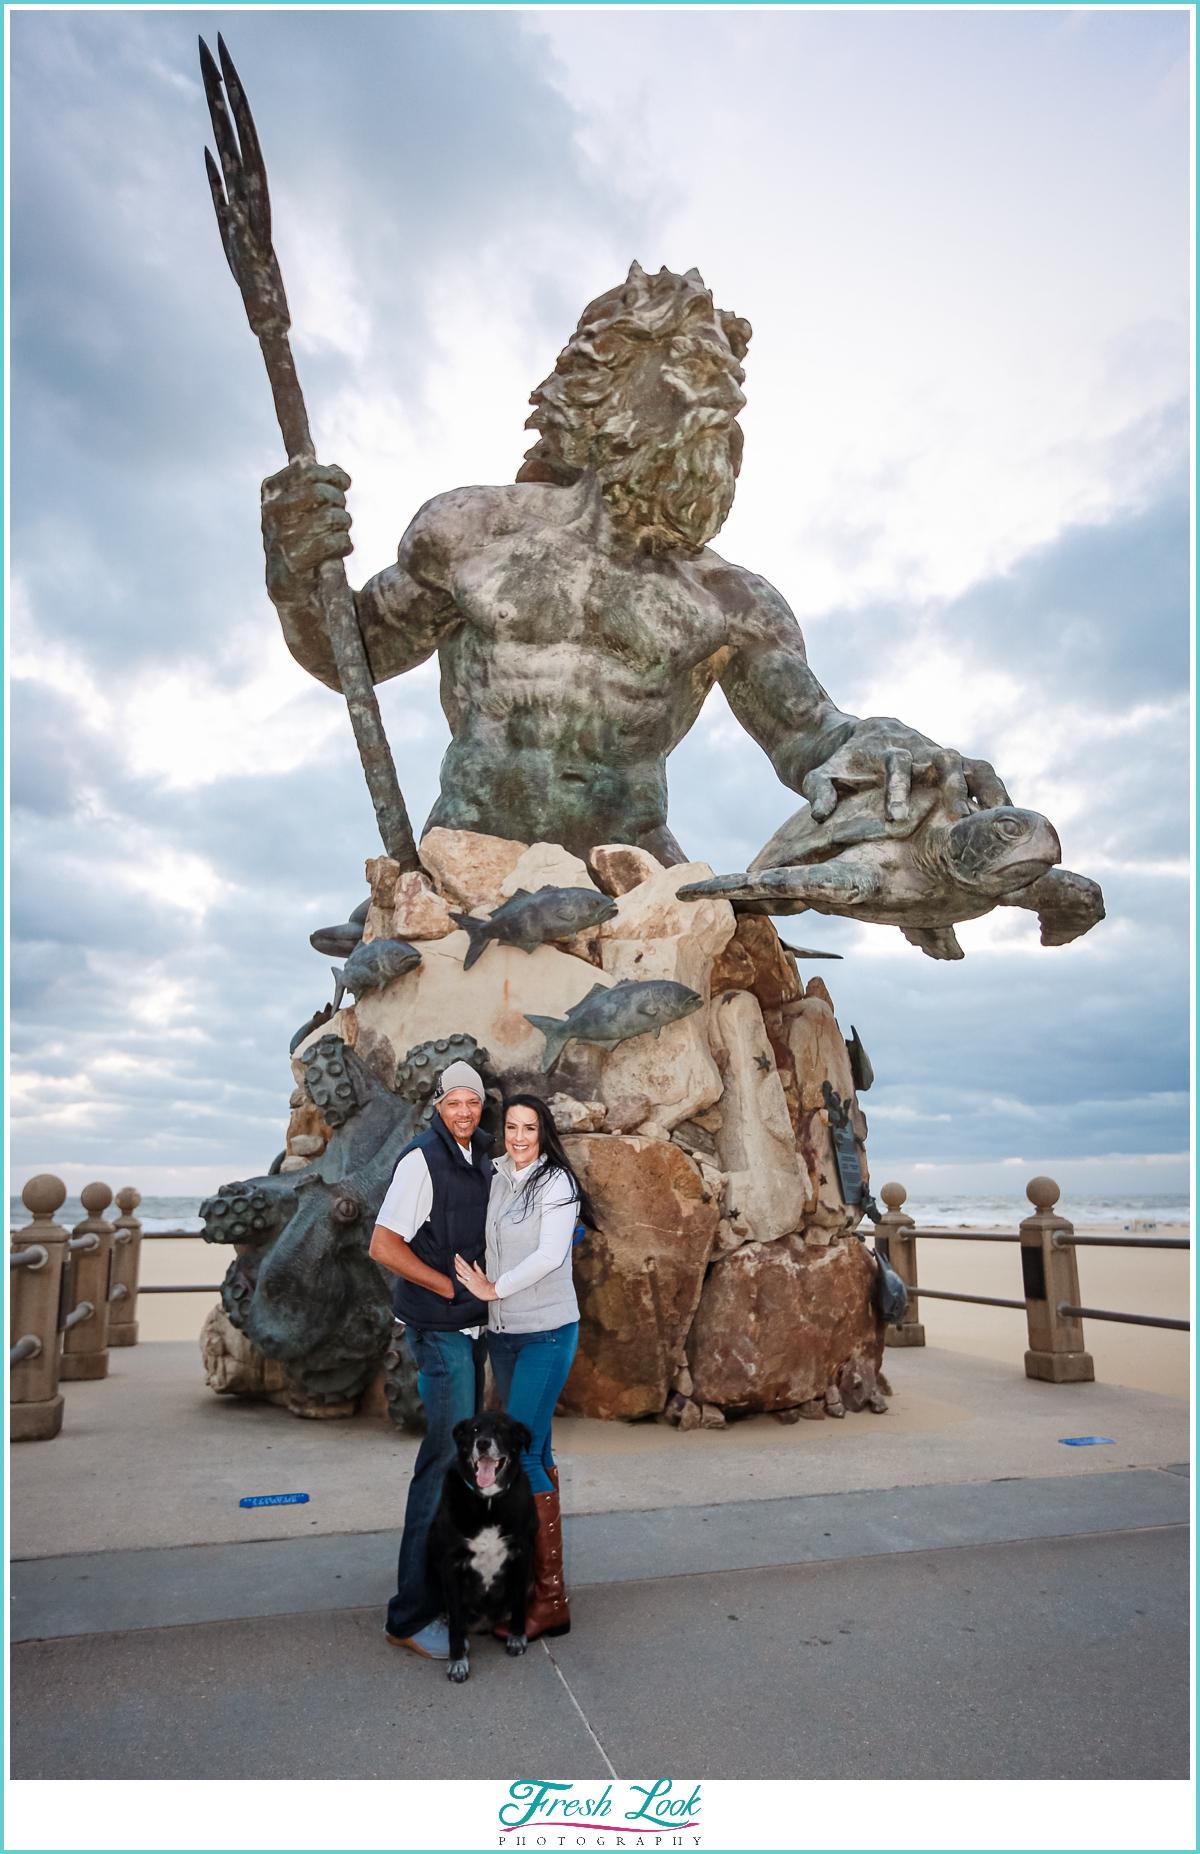 King Neptune Statue in Virginia Beach